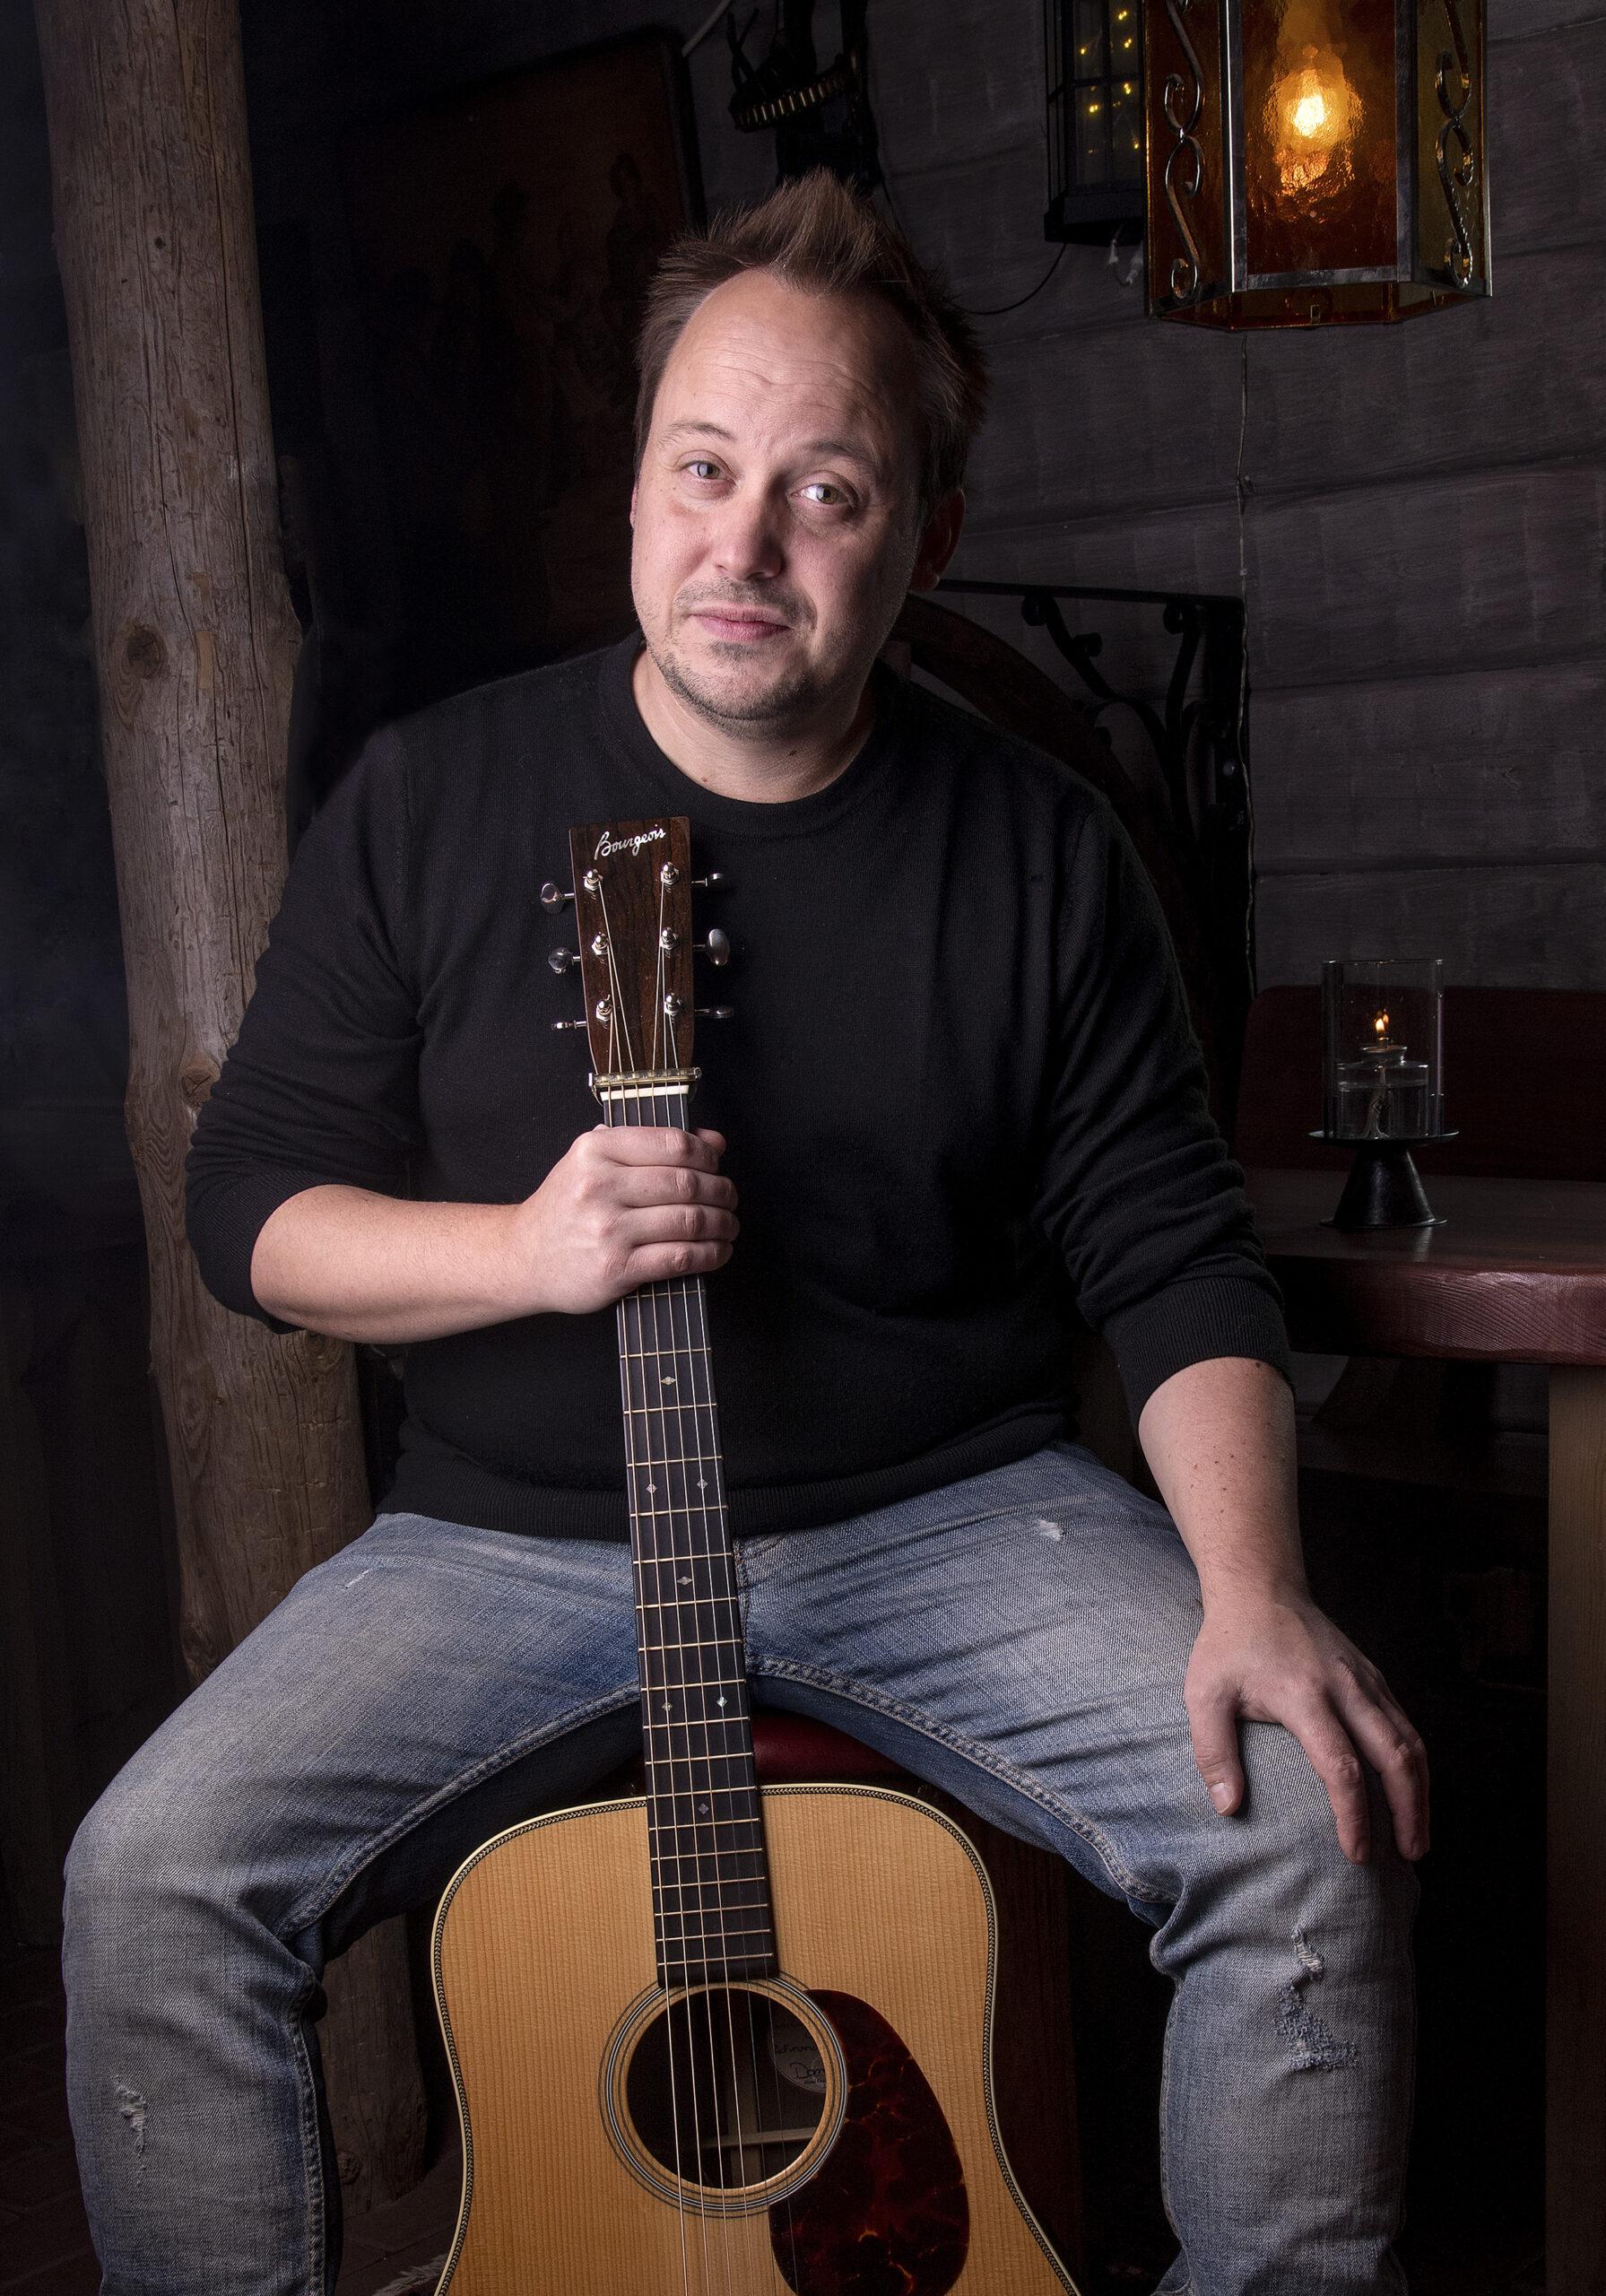 Christoffer Olsson